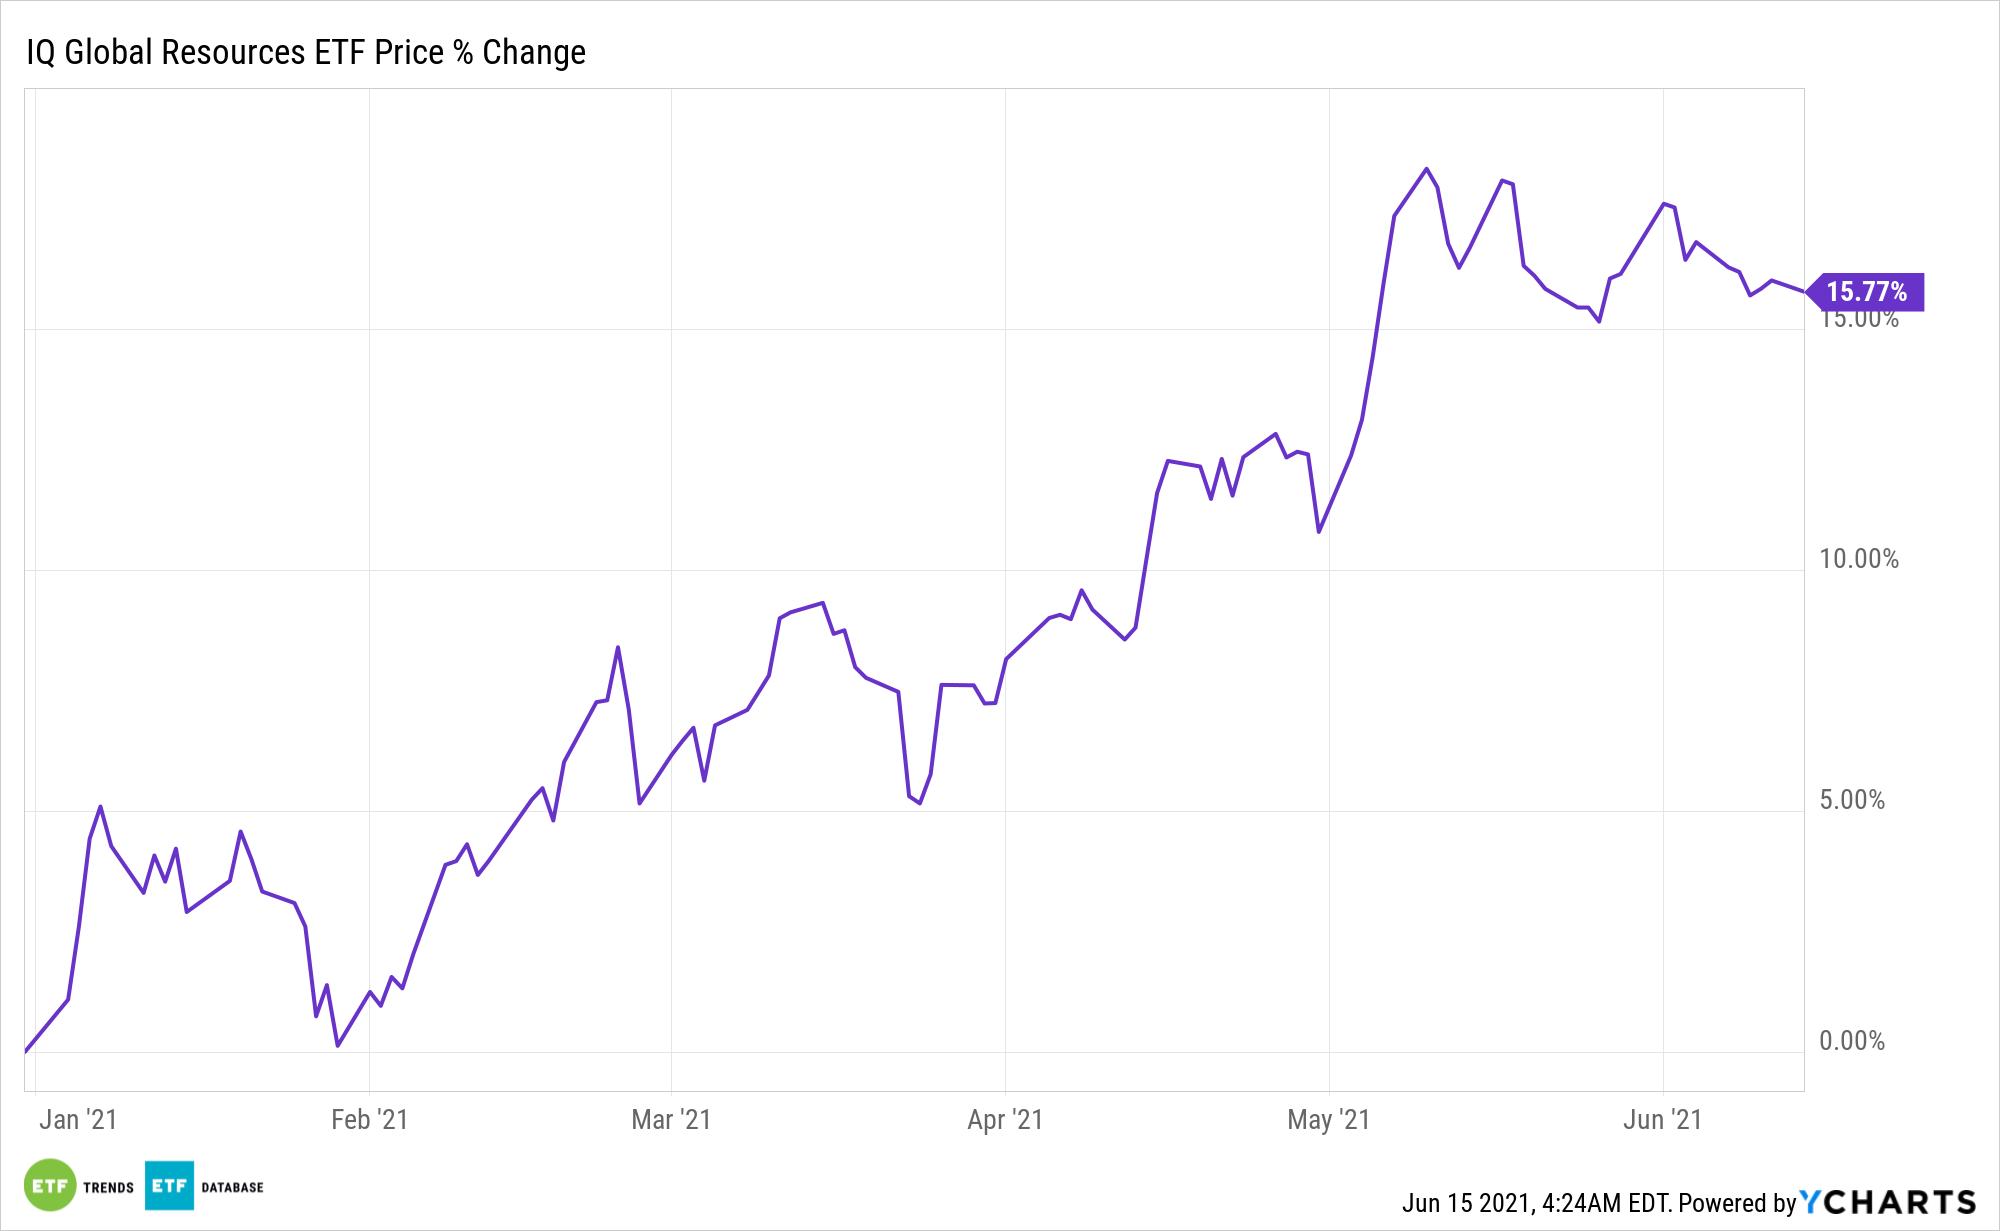 GRES Chart